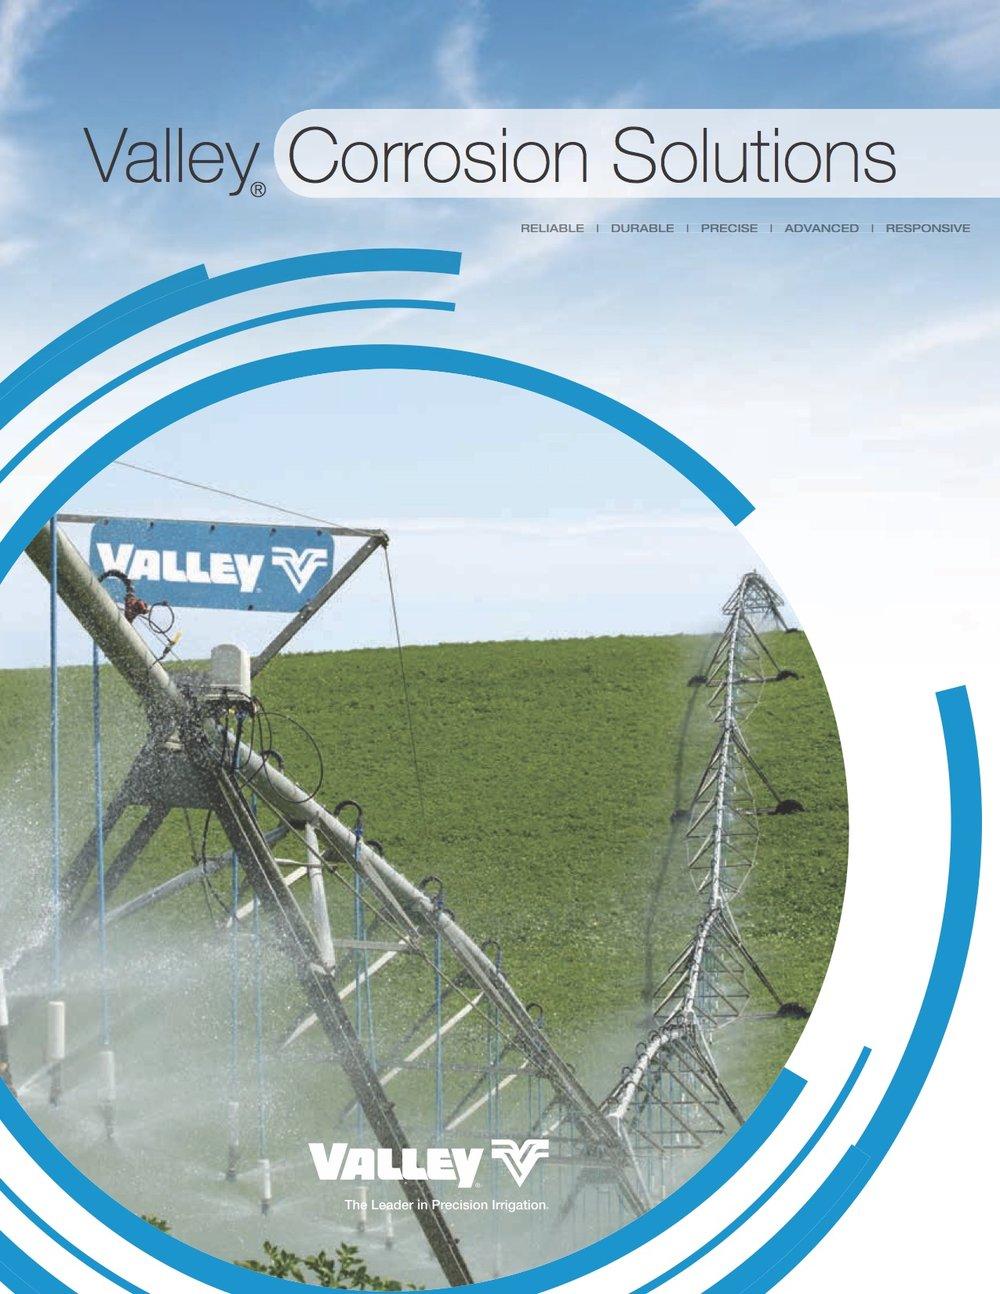 Corrosion Solutions Brochure